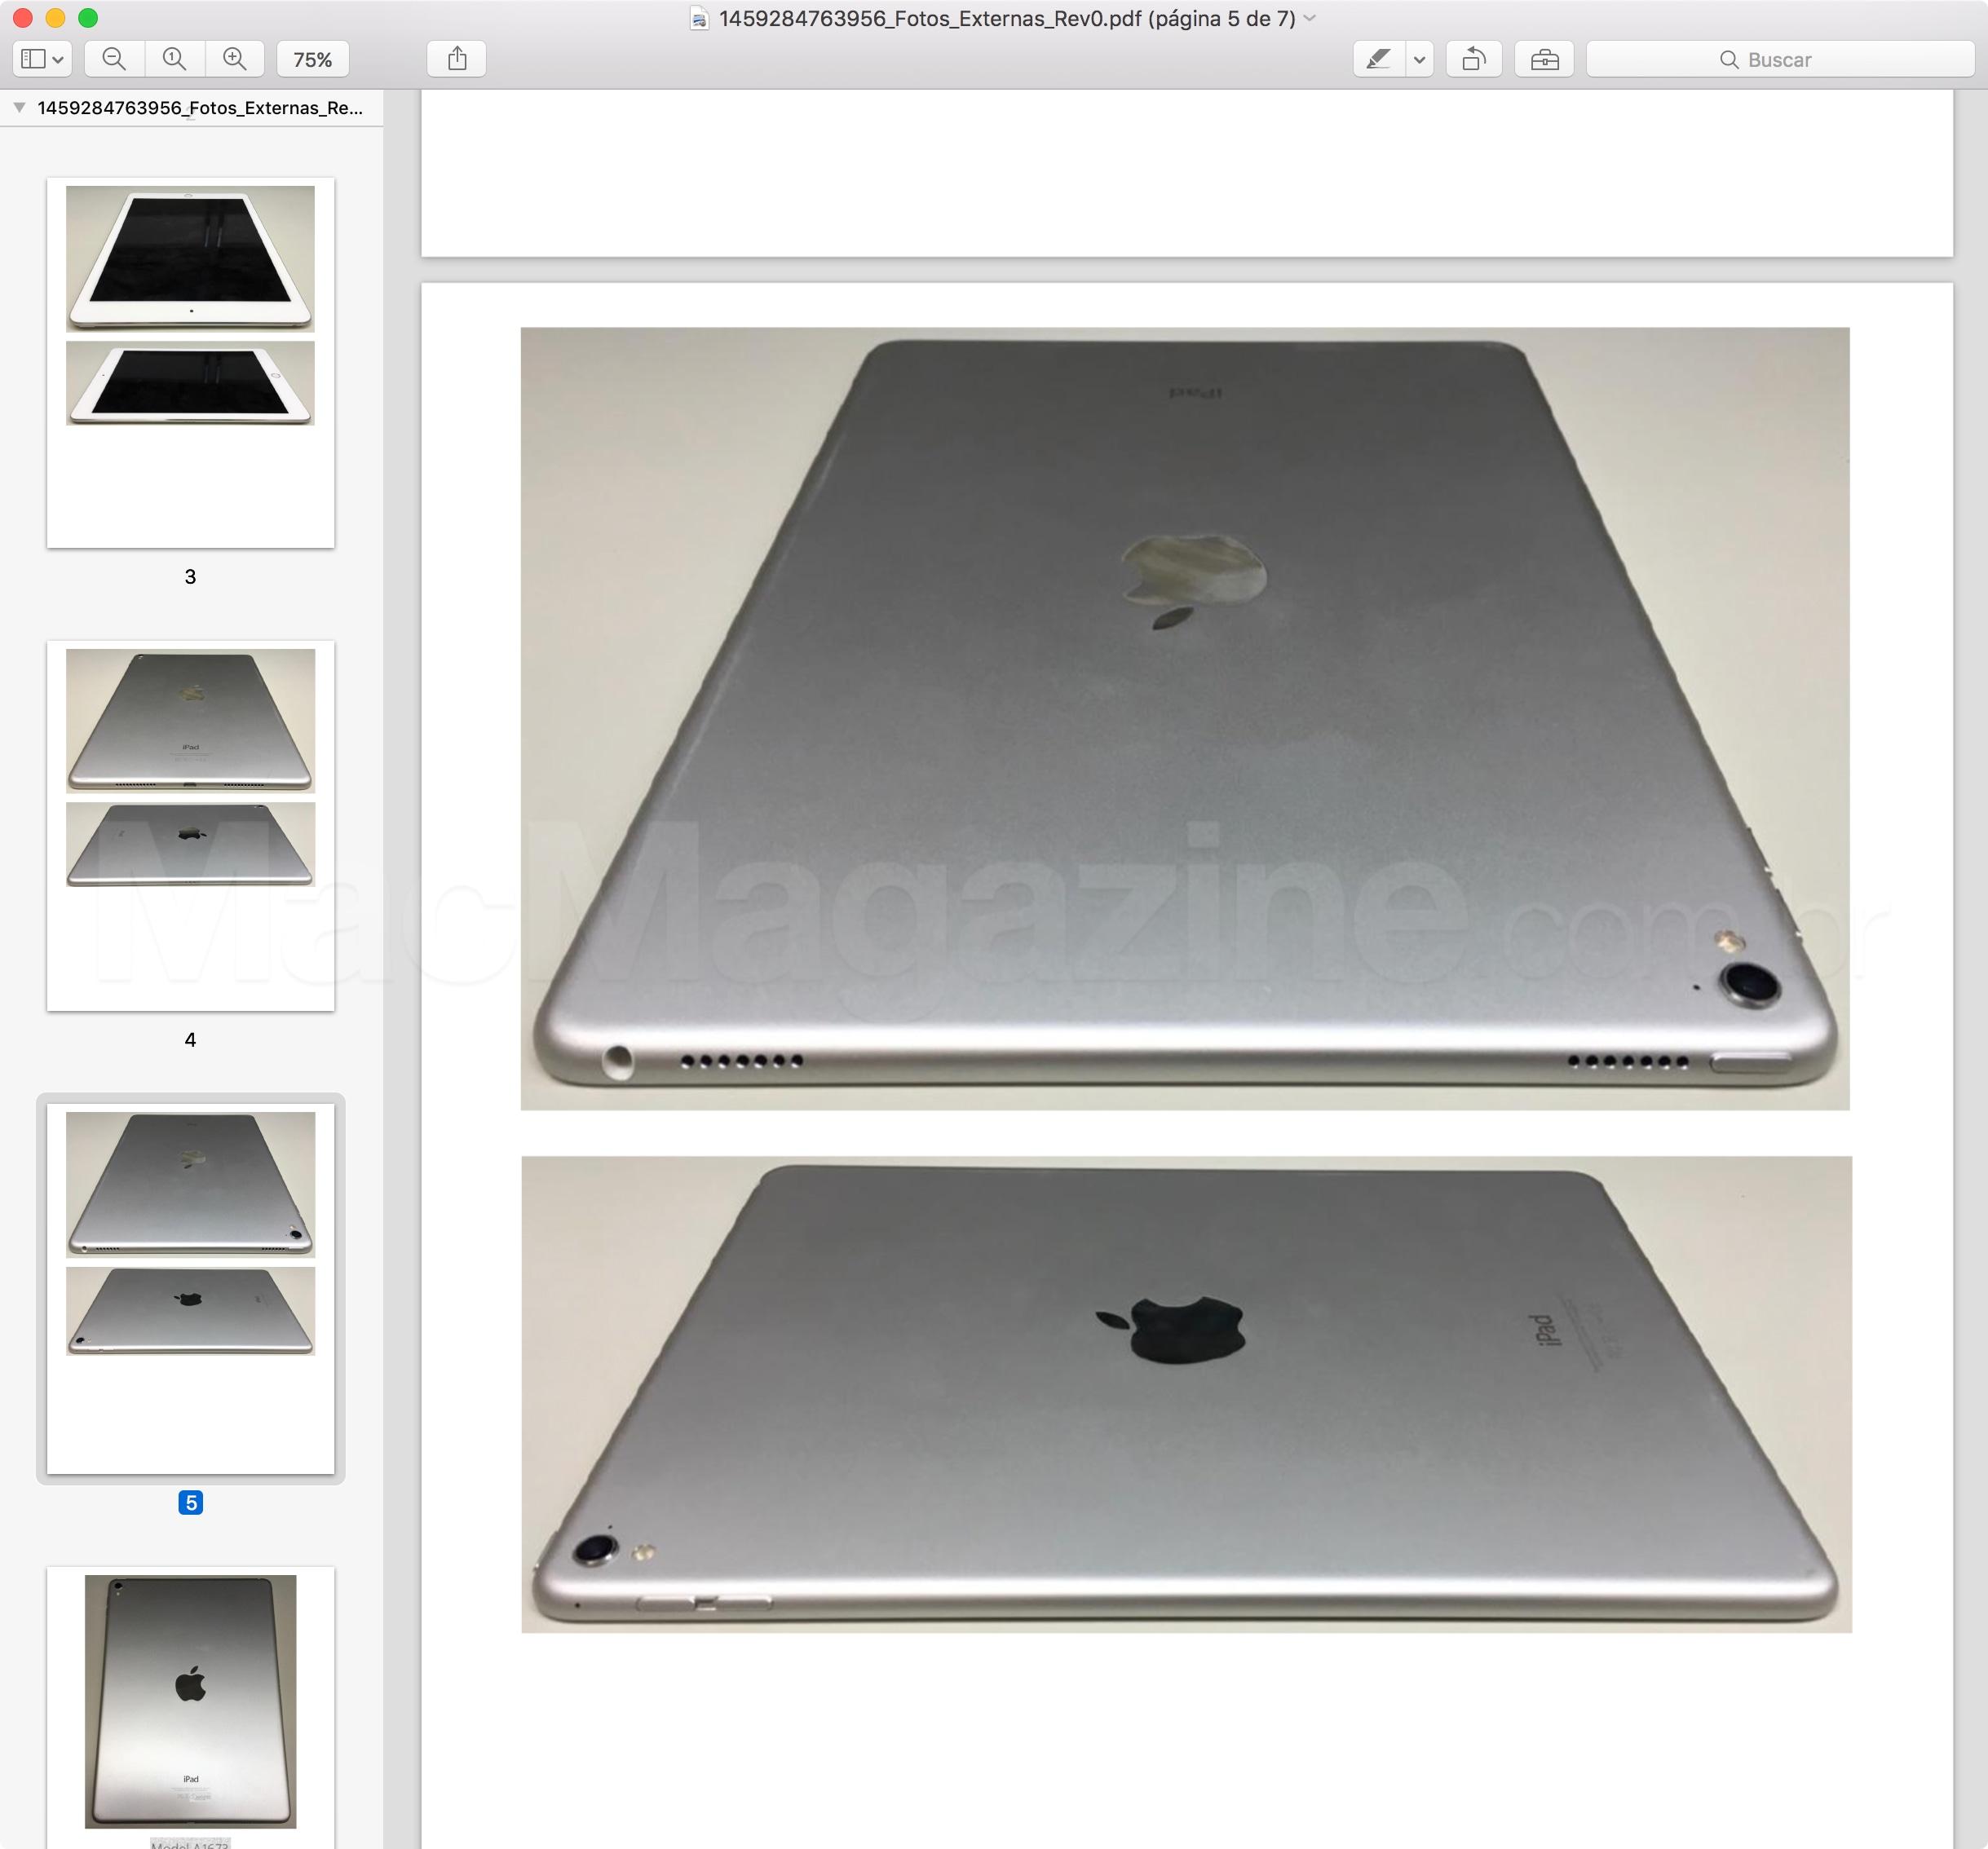 Anatel homologa iPad Pro de 9,7 polegadas Wi-Fi (A1673)